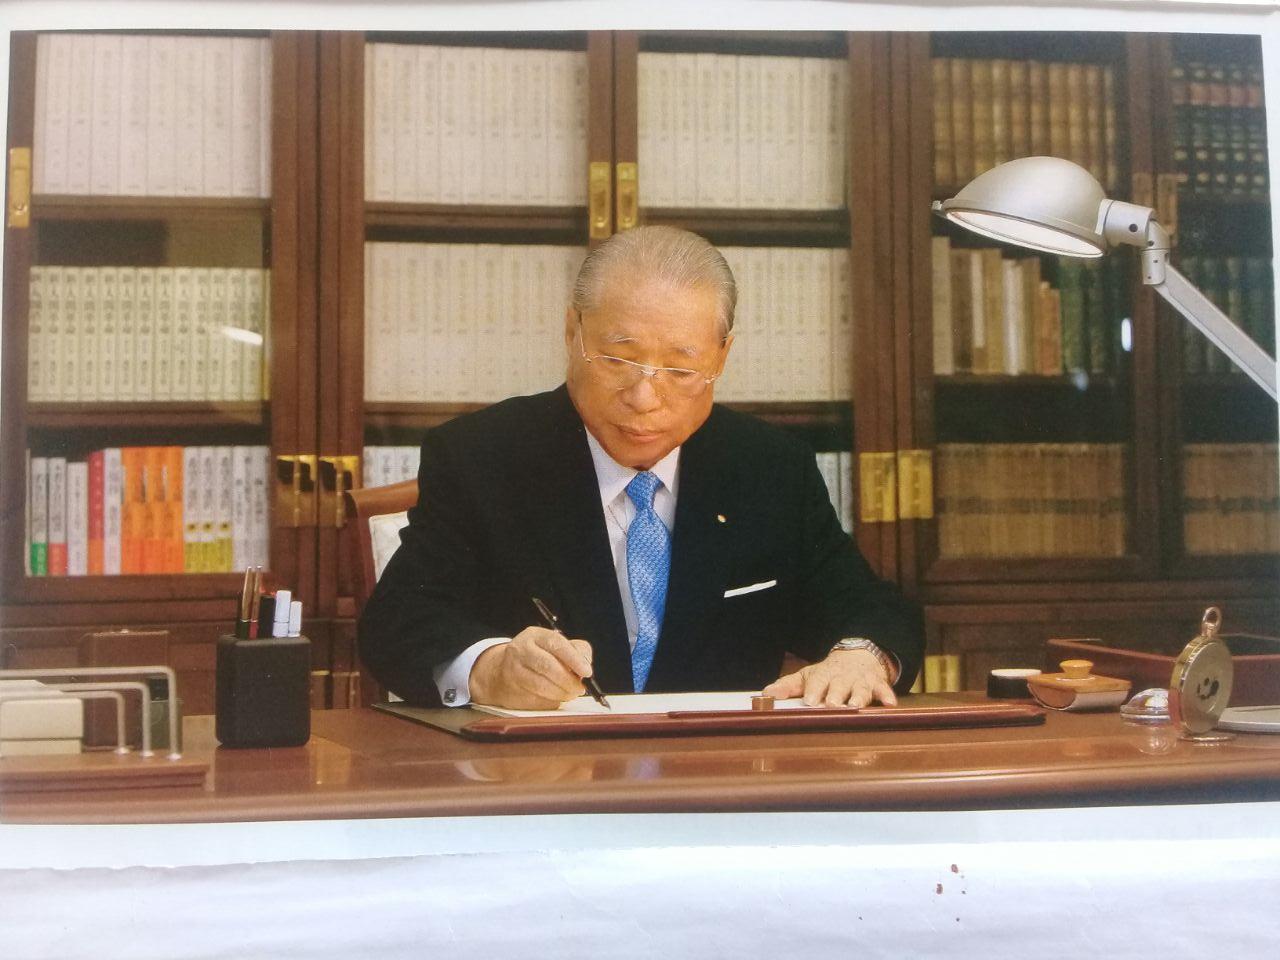 daisaku ikeda o mestre guia